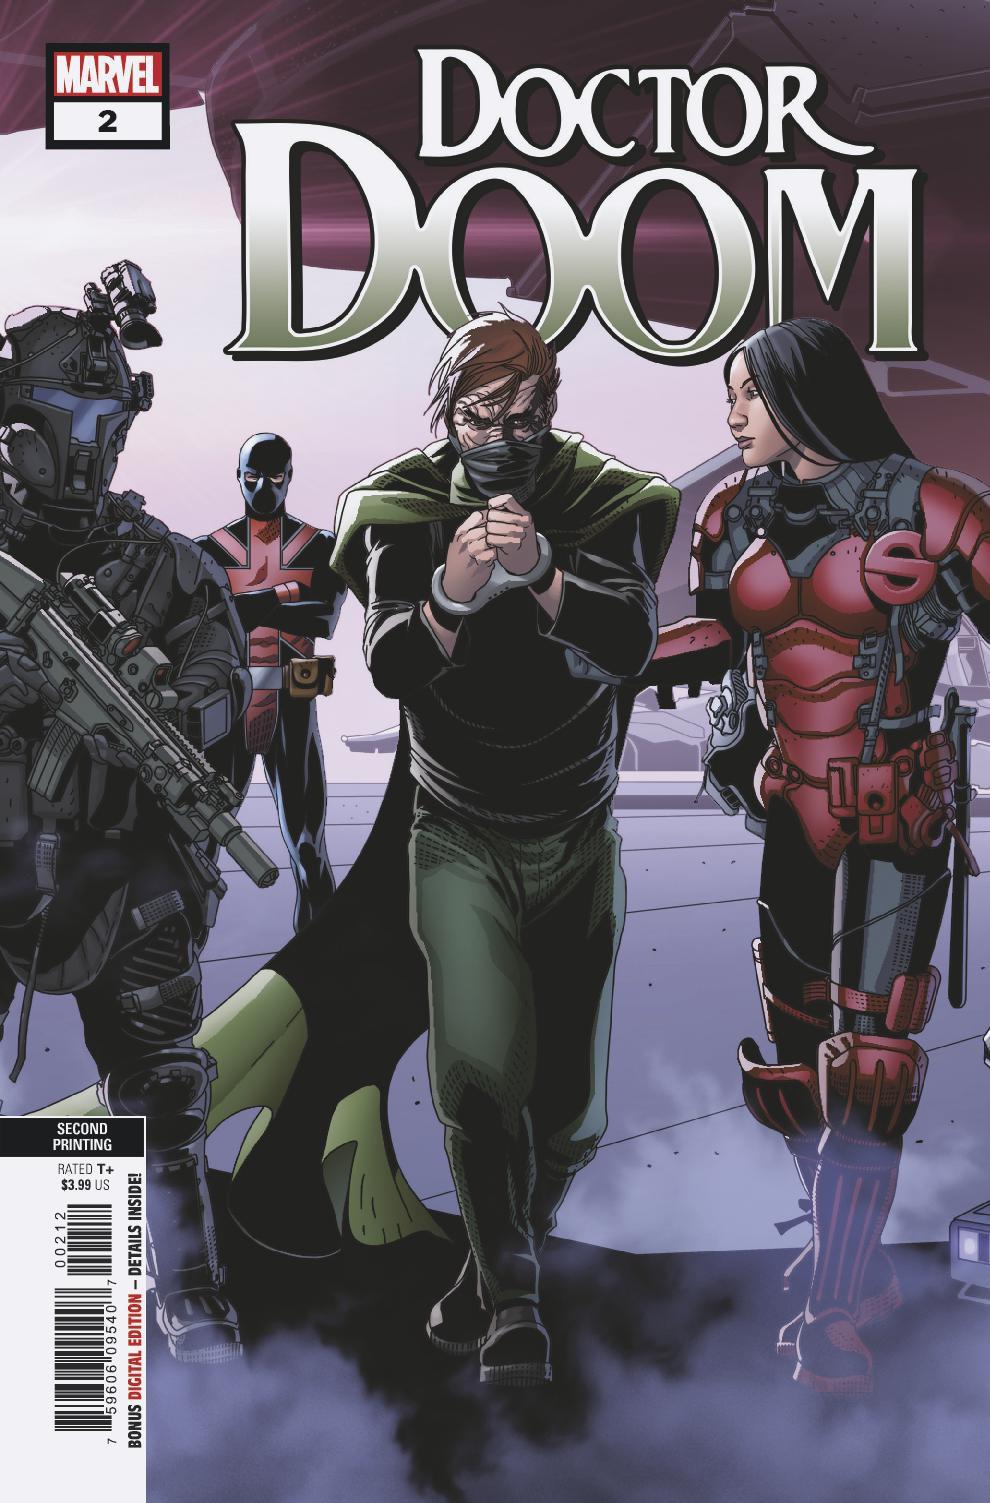 Doctor Doom Vol 1 2 Second Printing Variant.jpg